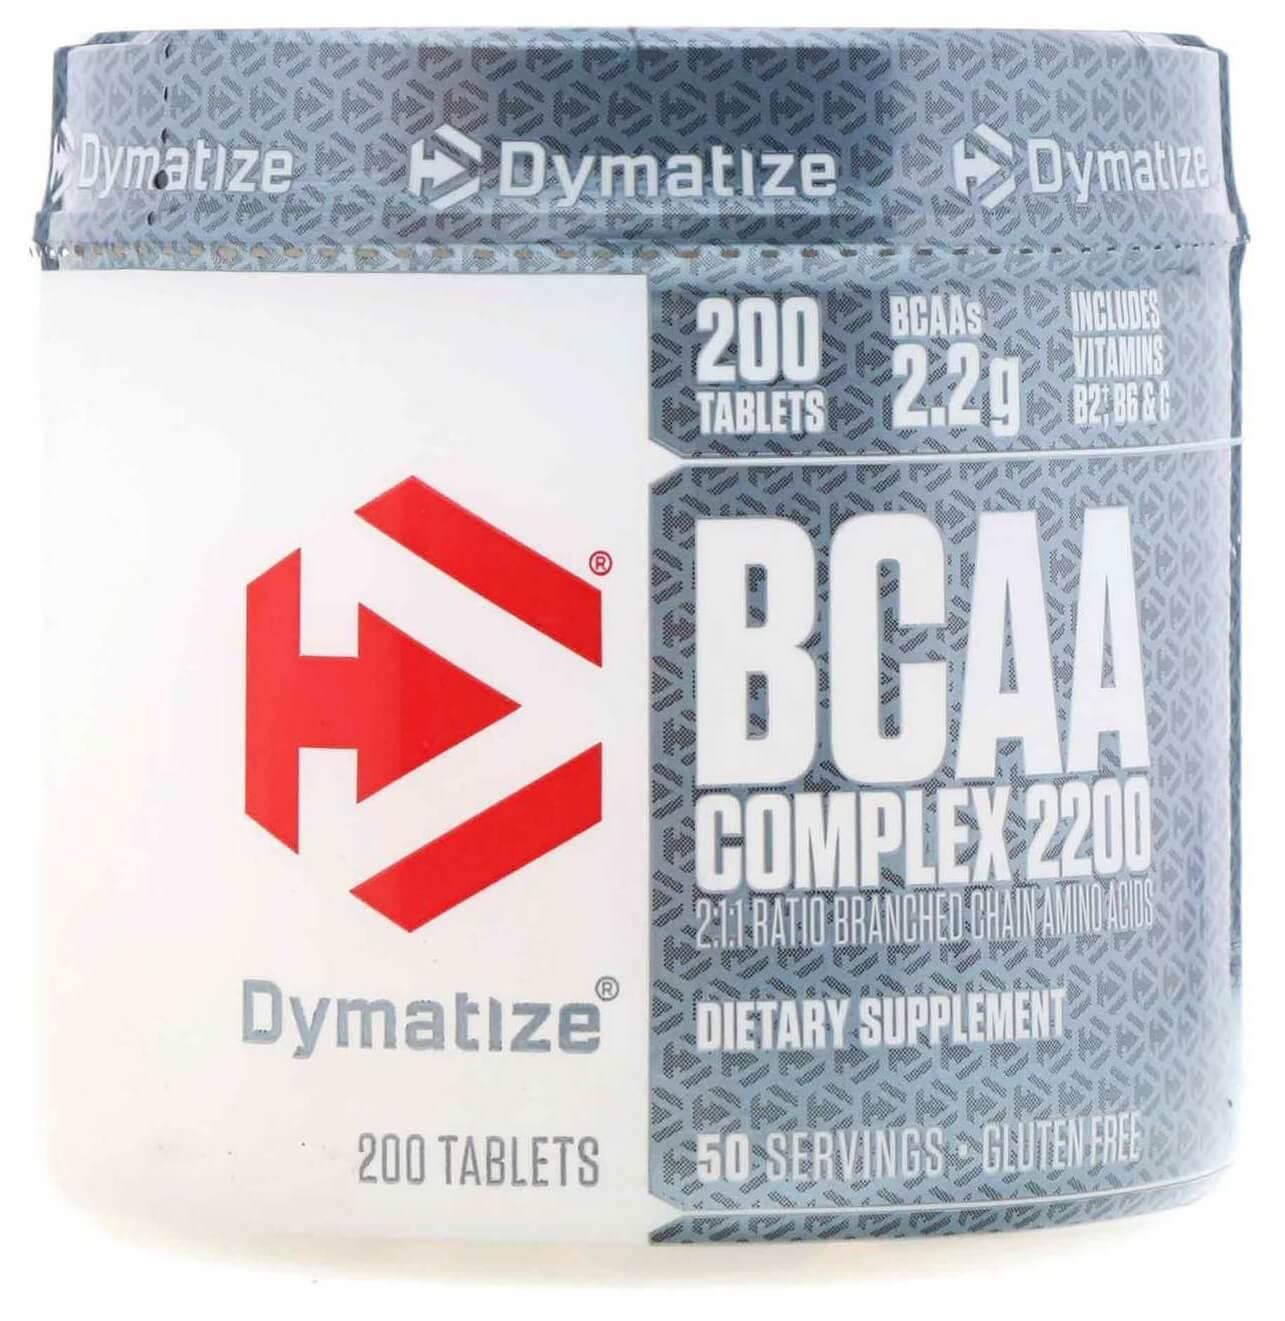 BCAA Complex 2200 Dymatize Nutrition - 200 caps